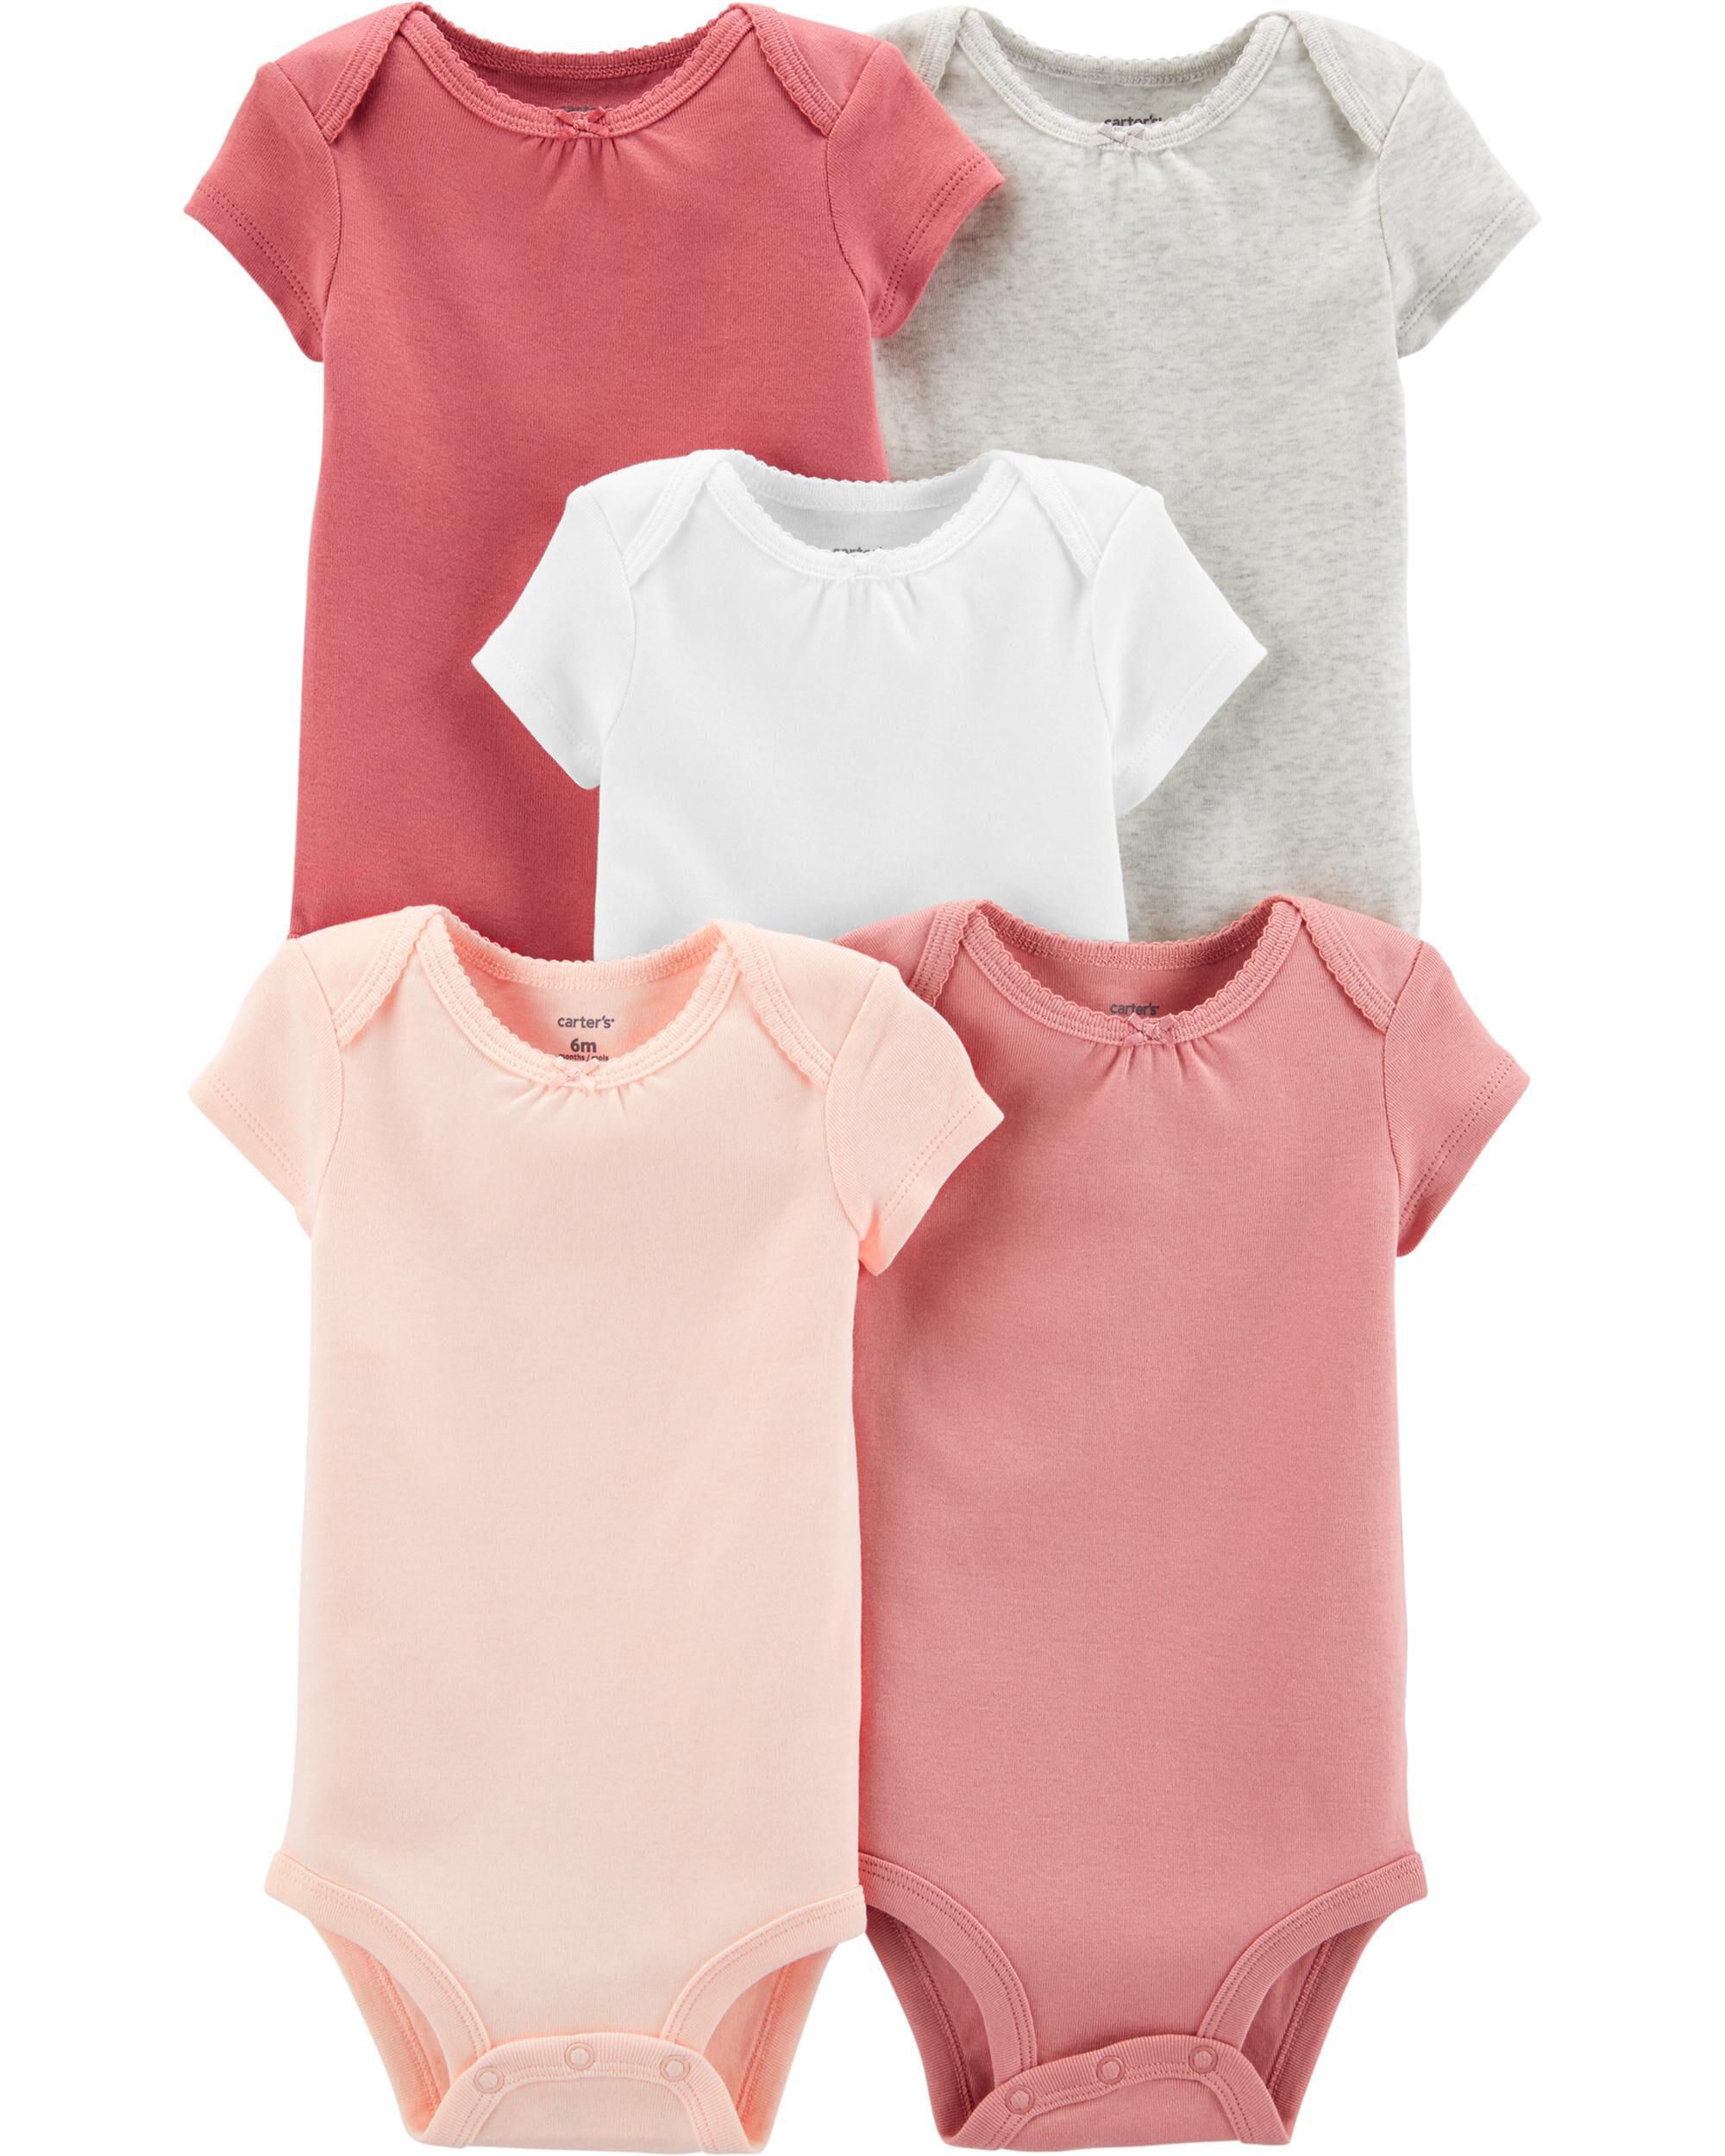 Carter/'s Baby Girl Carter/'s 6-pk Print Long Sleeve Bodysuits New Born 24 M